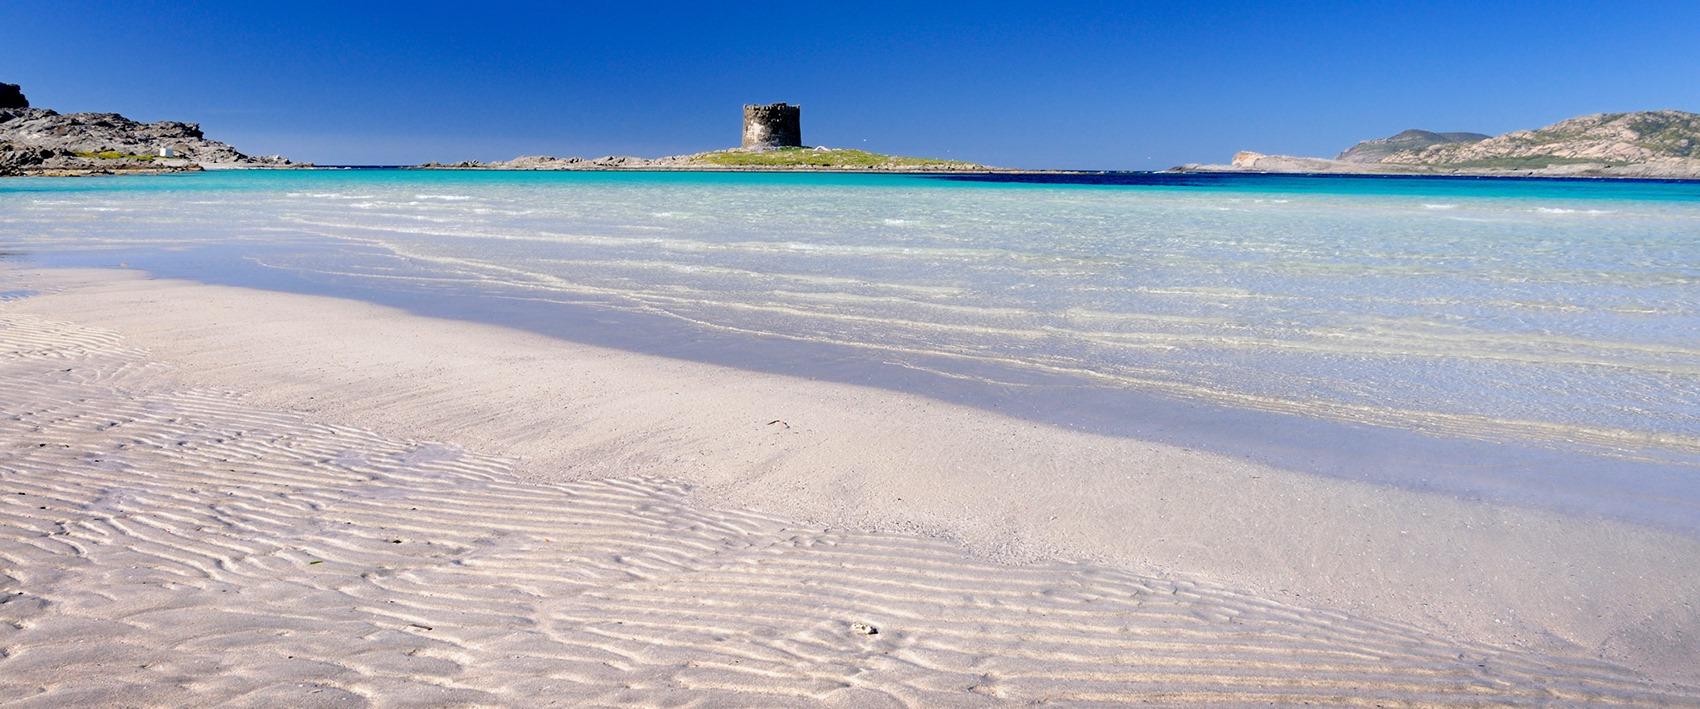 olbia spiagge libere